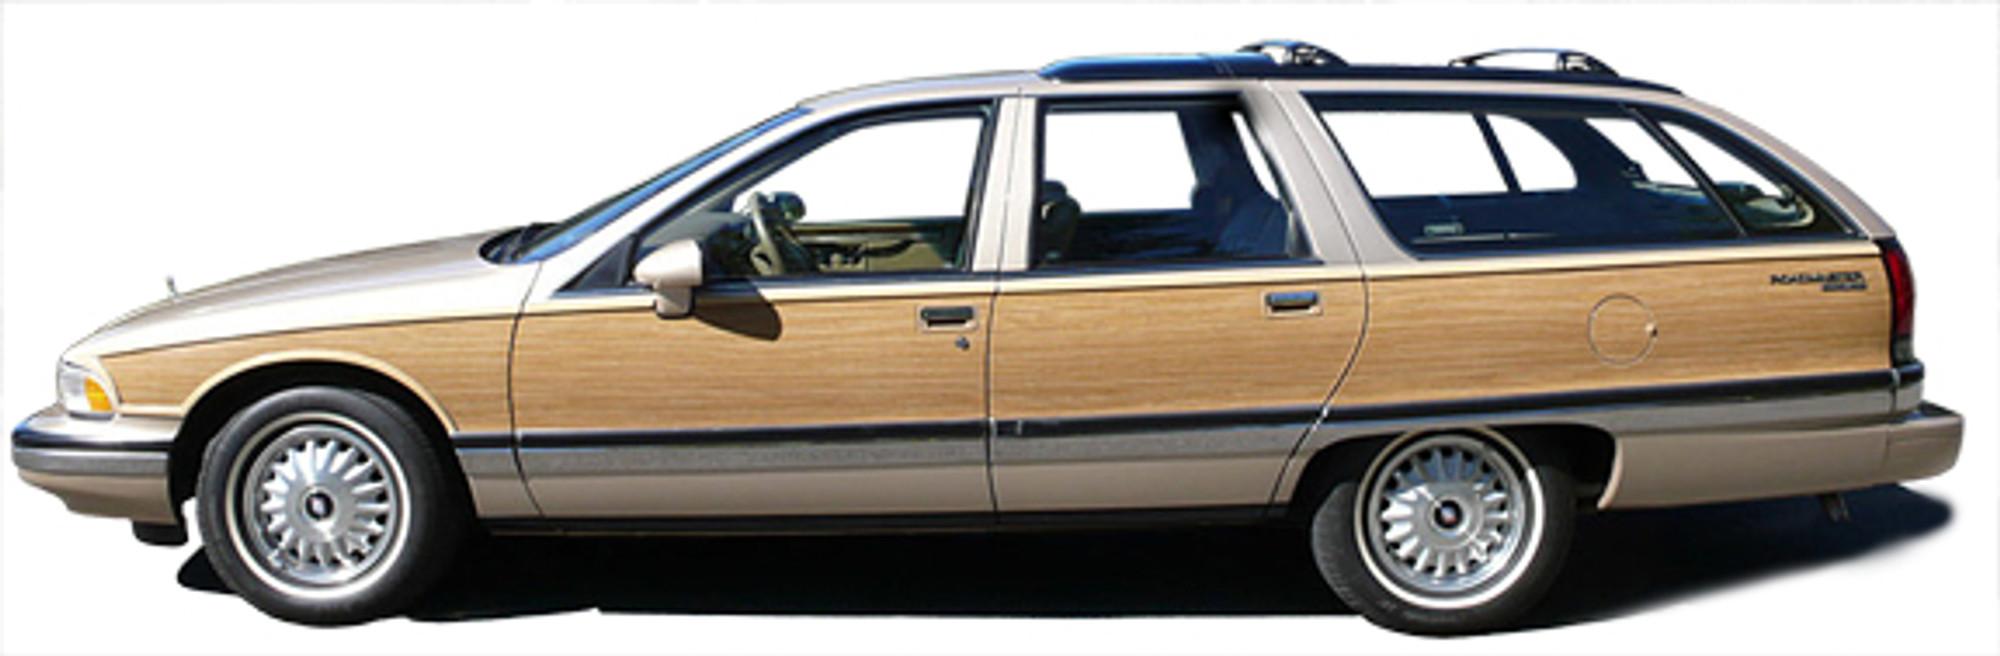 order custom roadmaster wagon wood grain vinyl pinstriping decals 91 96 buick roadmaster wagon burma teak digital reproduction wood grain vinyl replacement kit